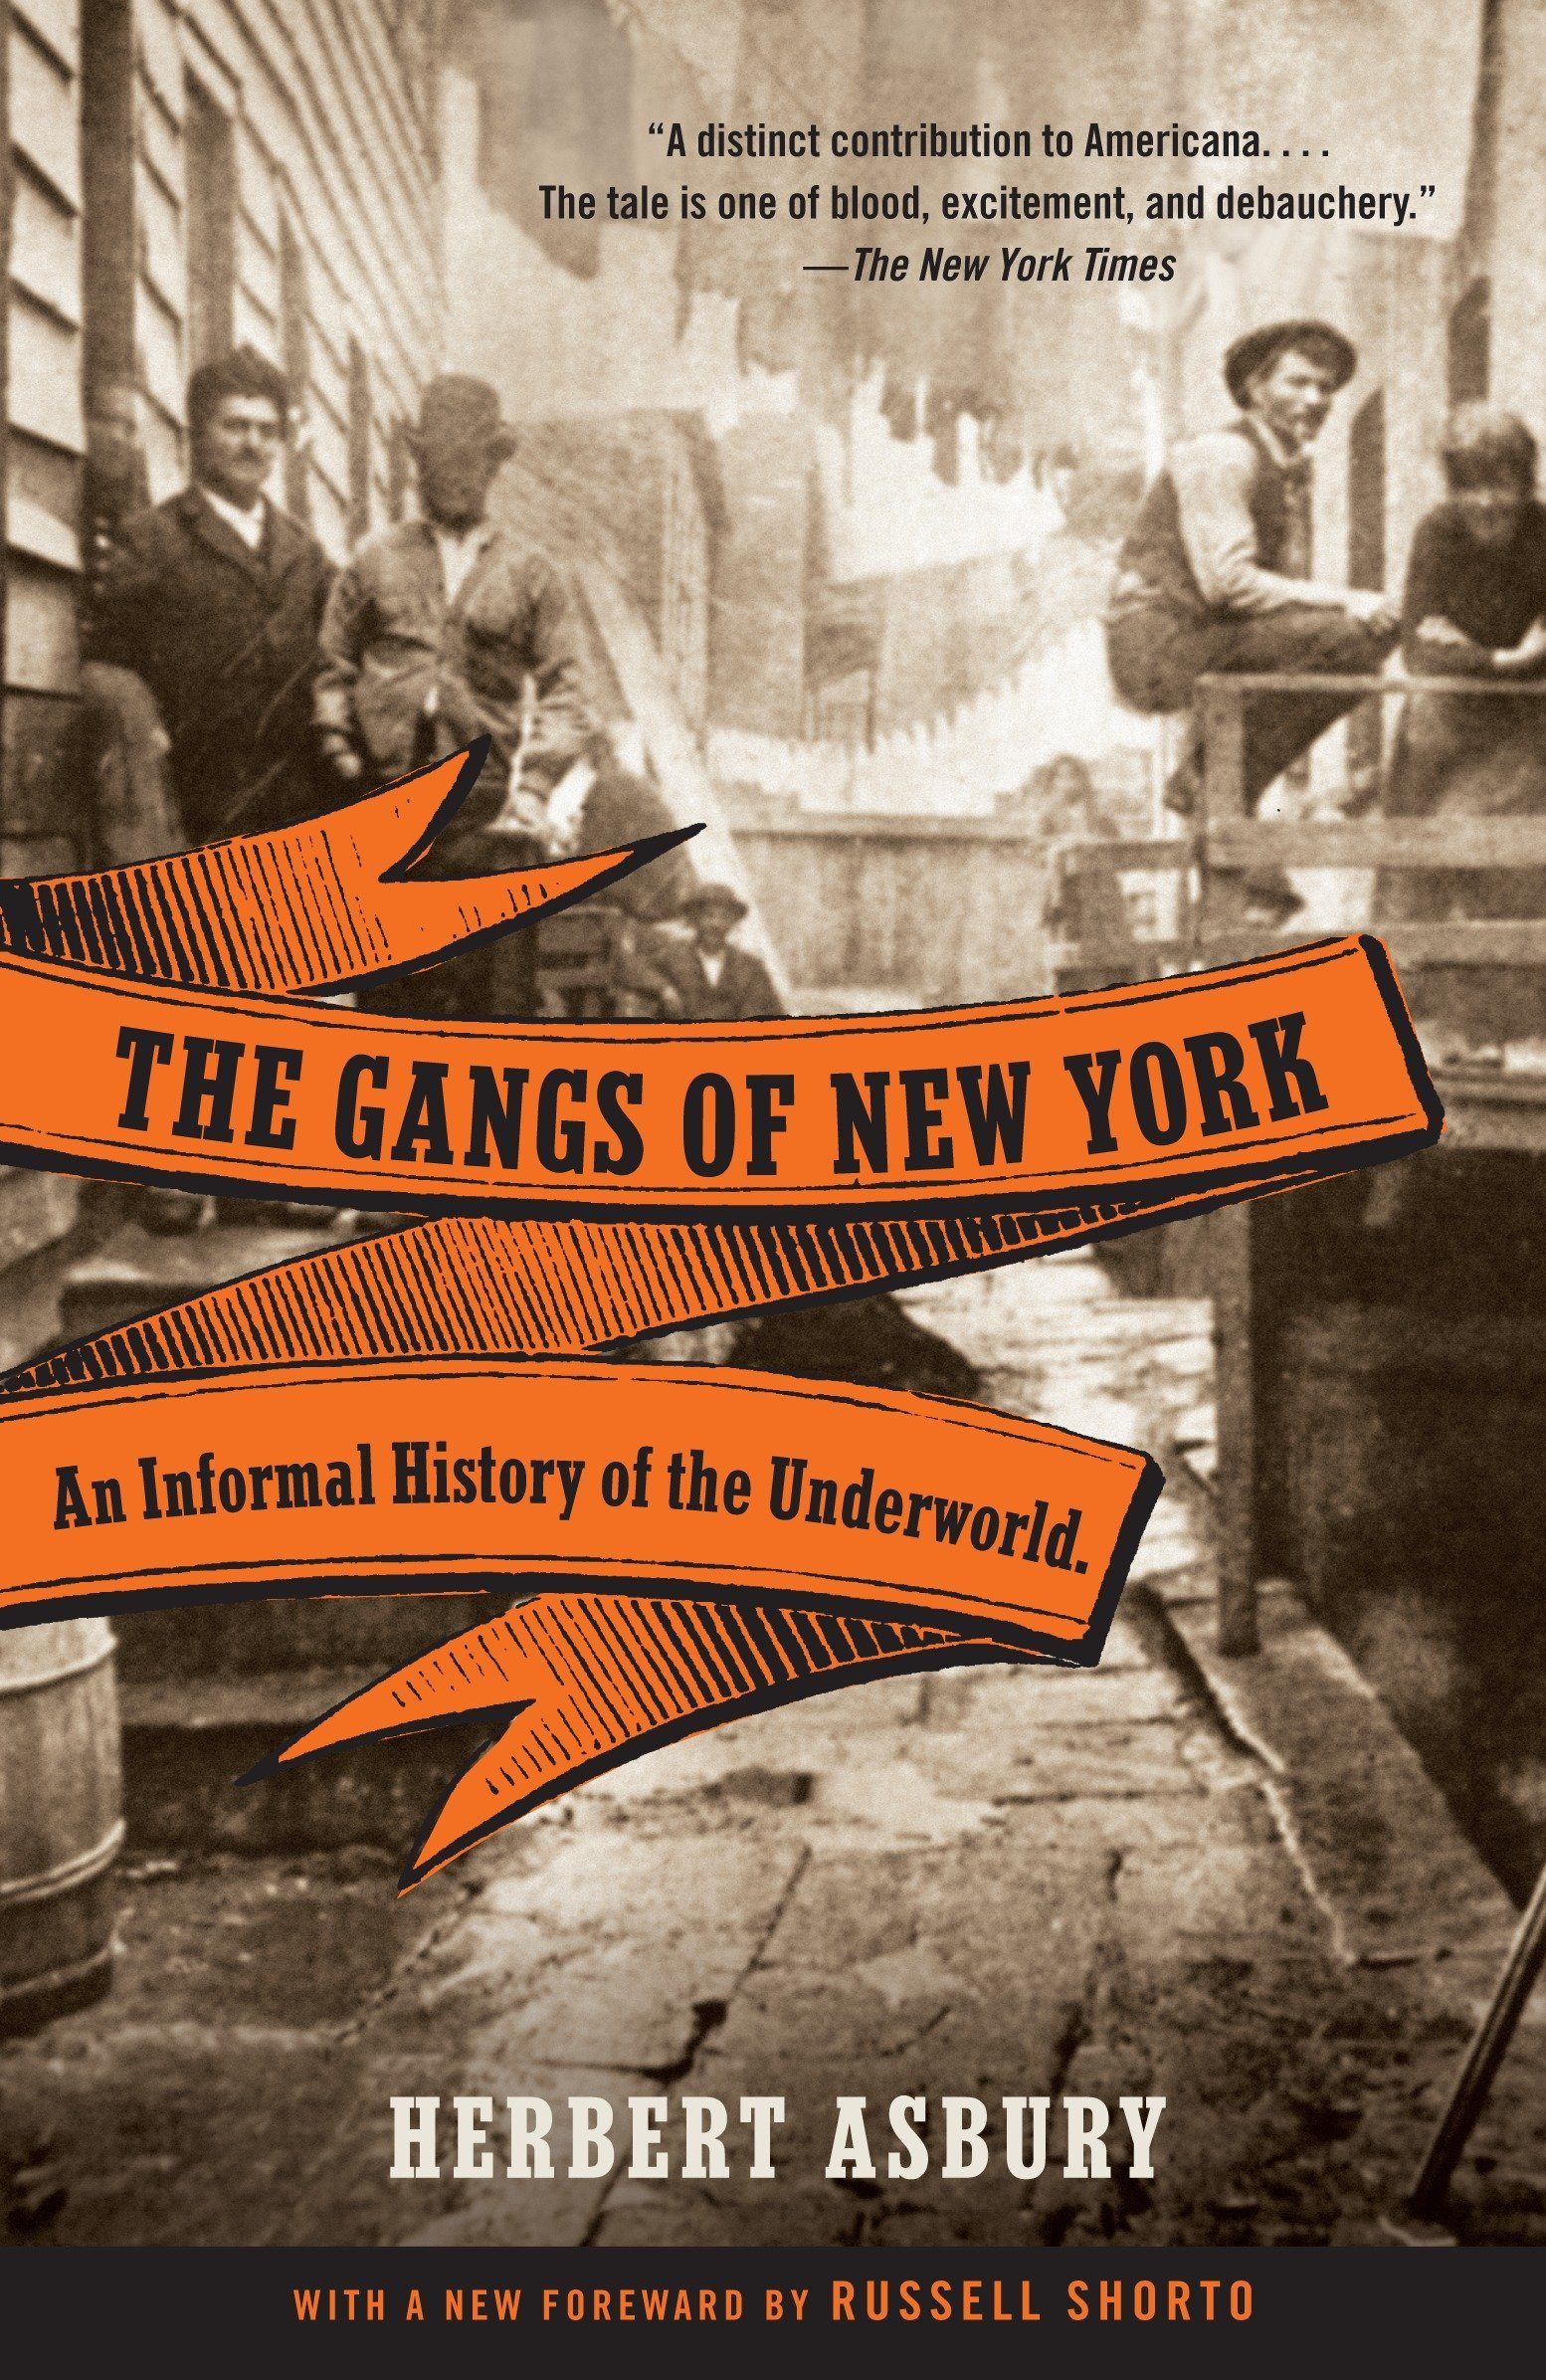 The Gangs of New York: An Informal History of the Underworld Vintage: Amazon.es: Herbert Asbury: Libros en idiomas extranjeros